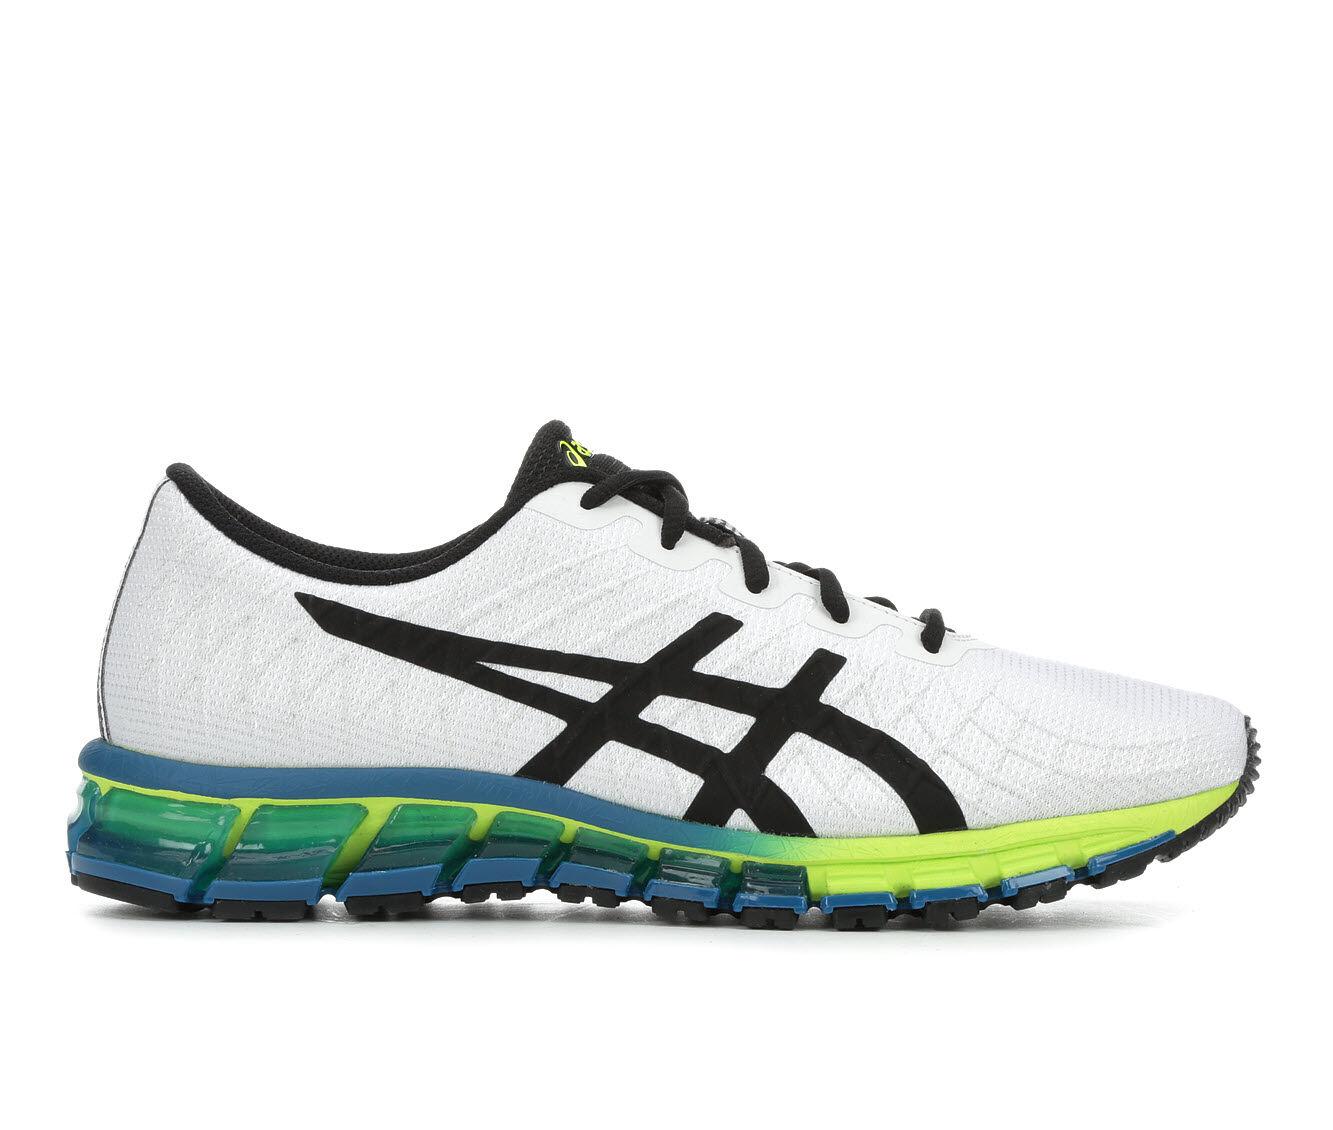 Men's ASICS Gel Quantum 180 4 - M Running Shoes Wht/Grn/Yell